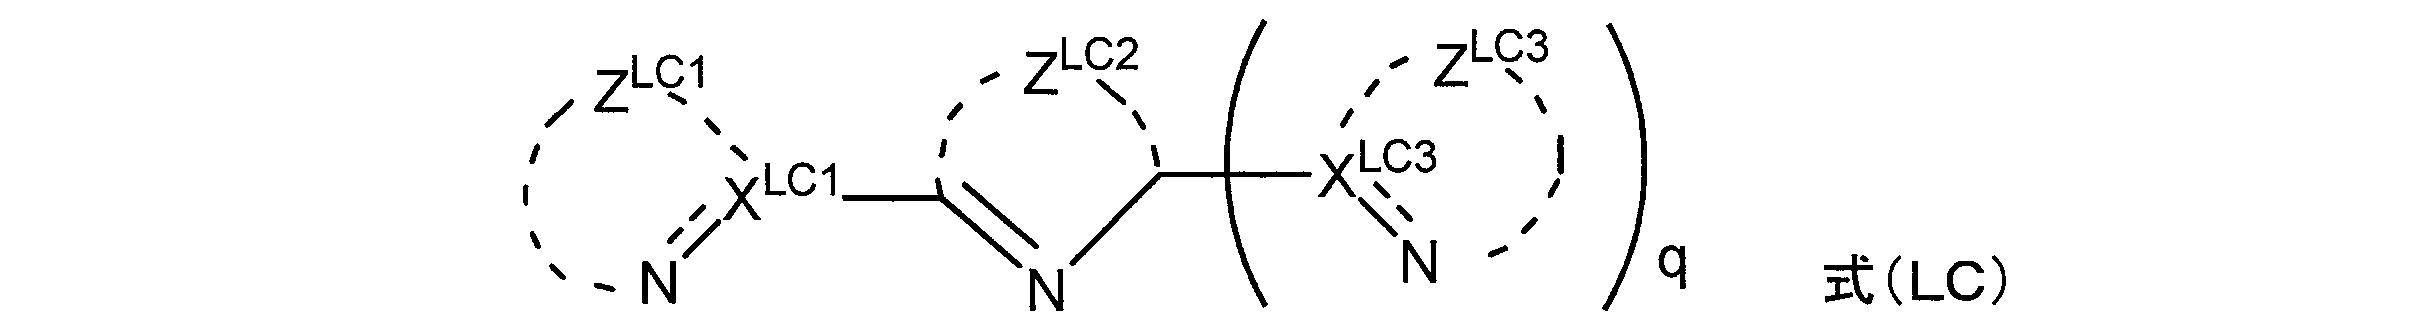 Wo2014077357a1 metal complex metal complex dye photoelectric figure jpoxmldoc01 appb c000063 pooptronica